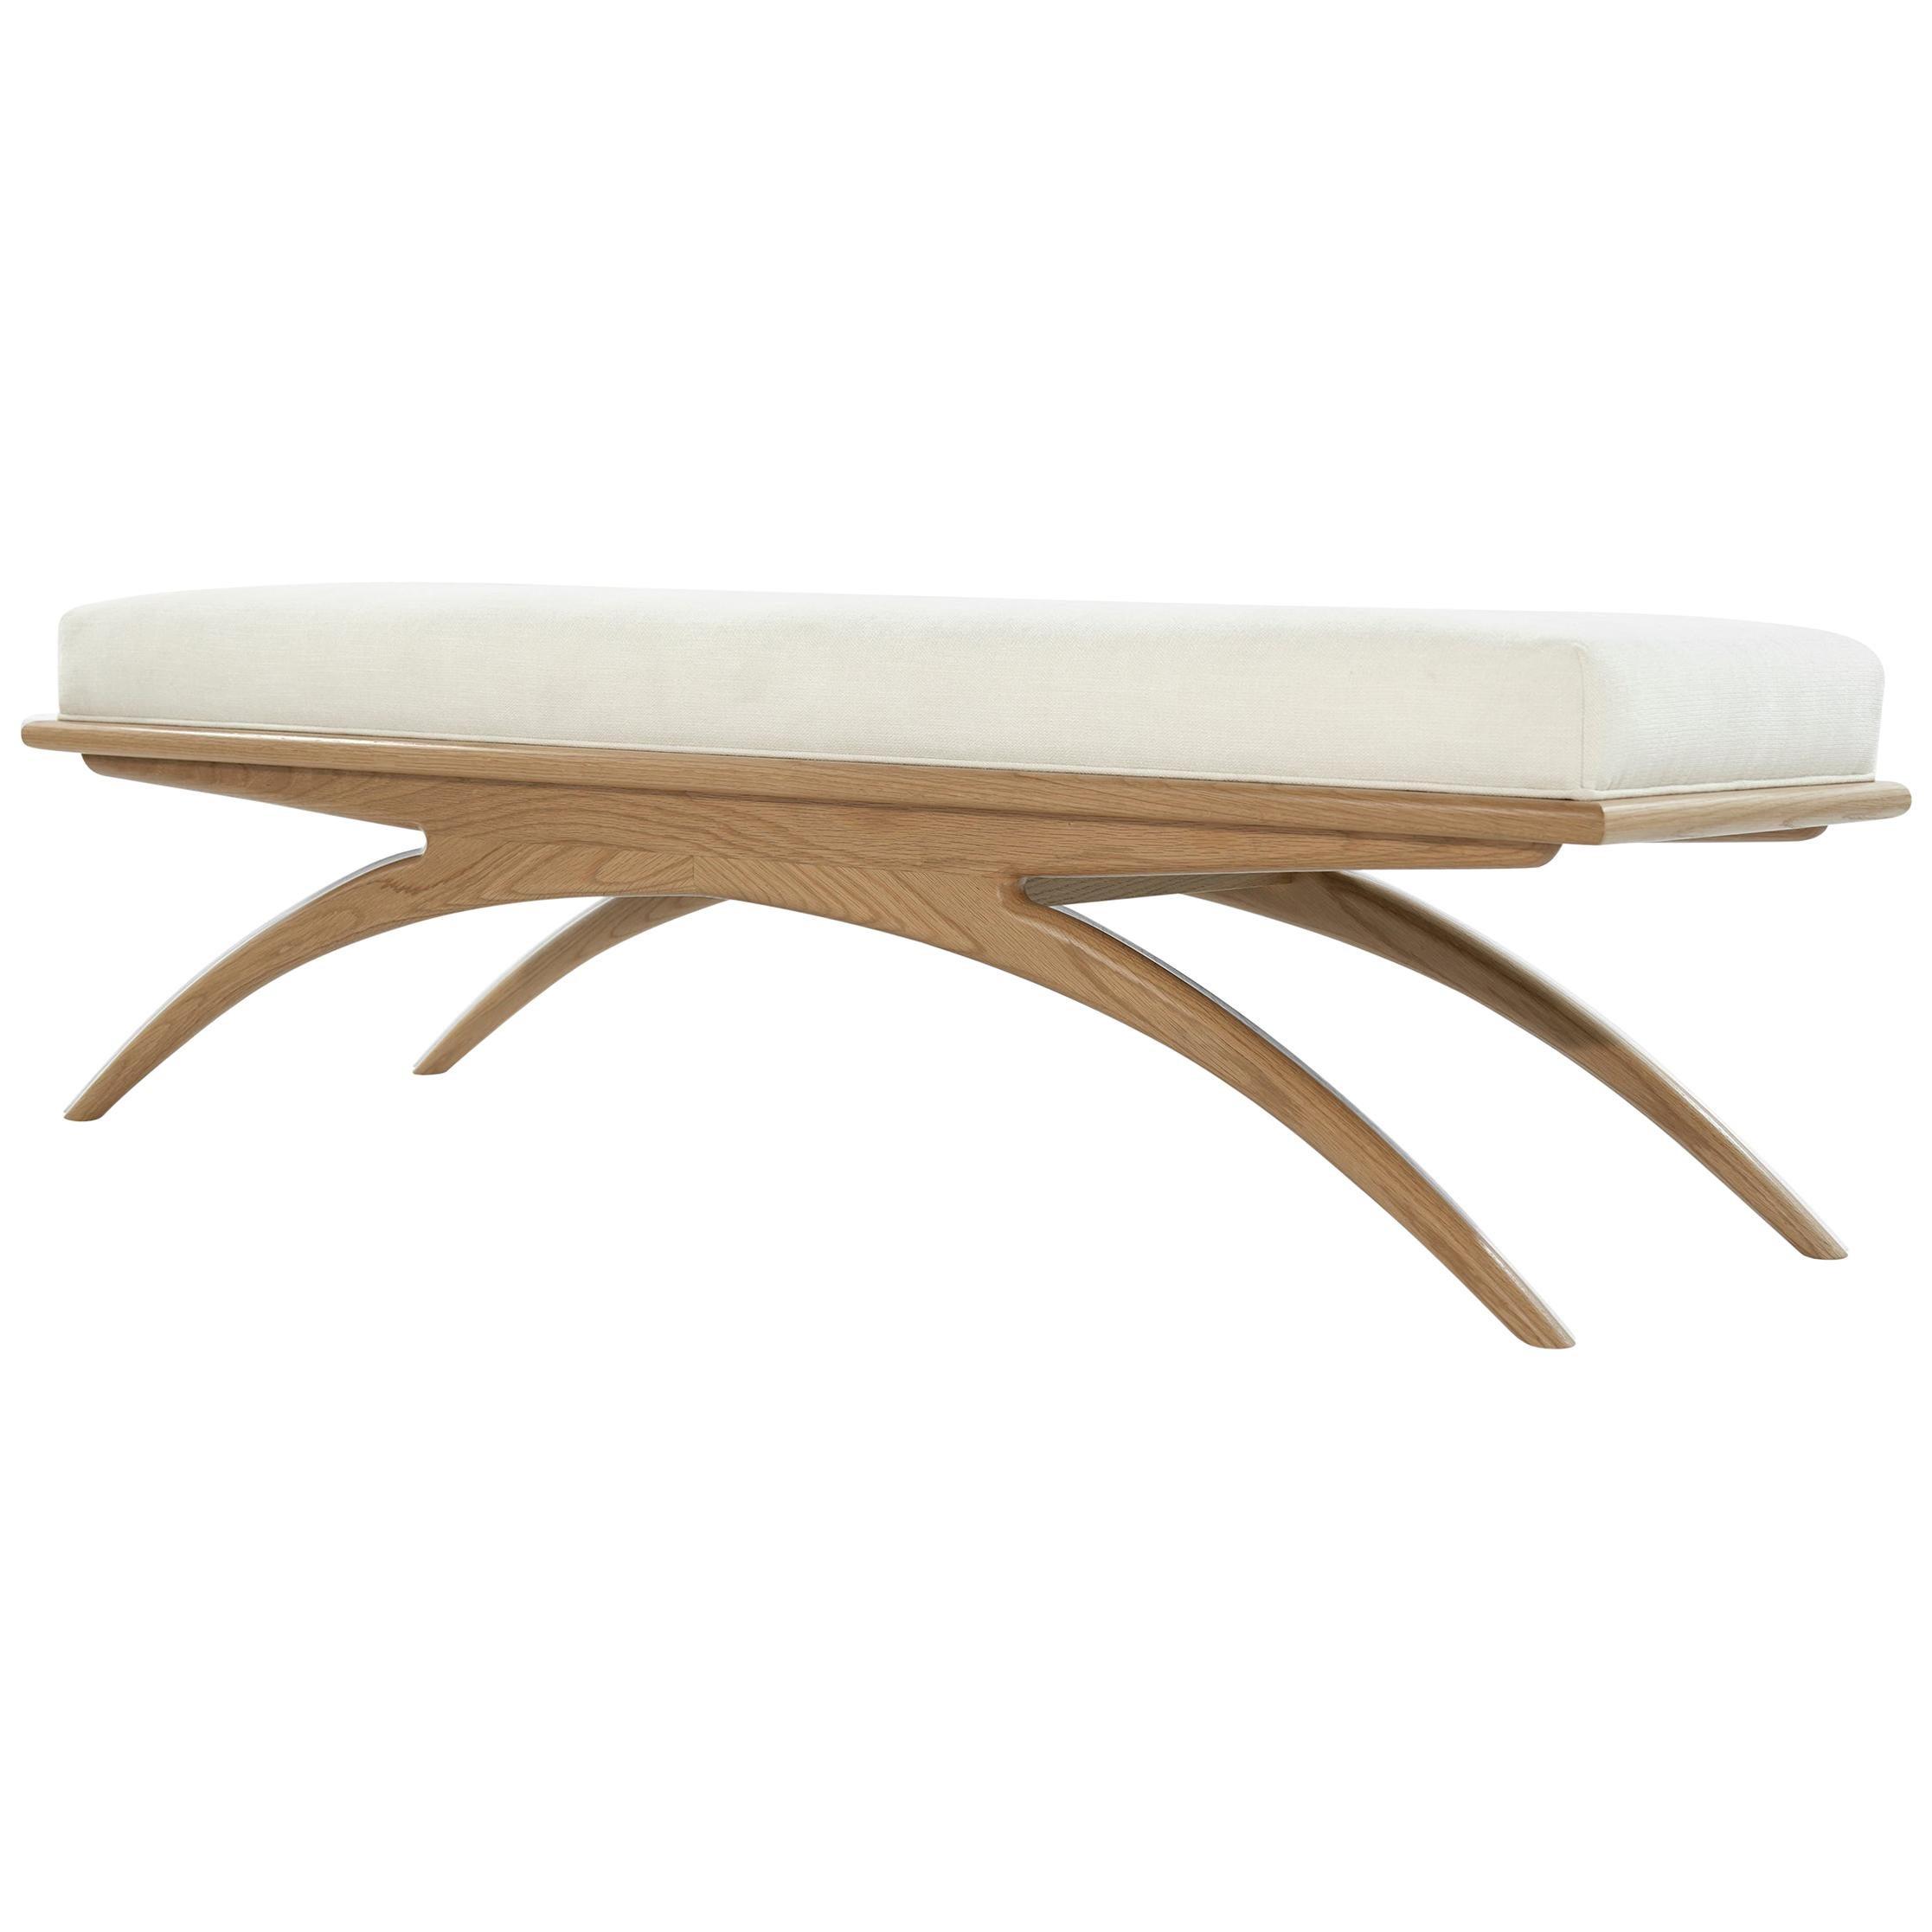 Natural Oak Convex Bench by Stamford Modern